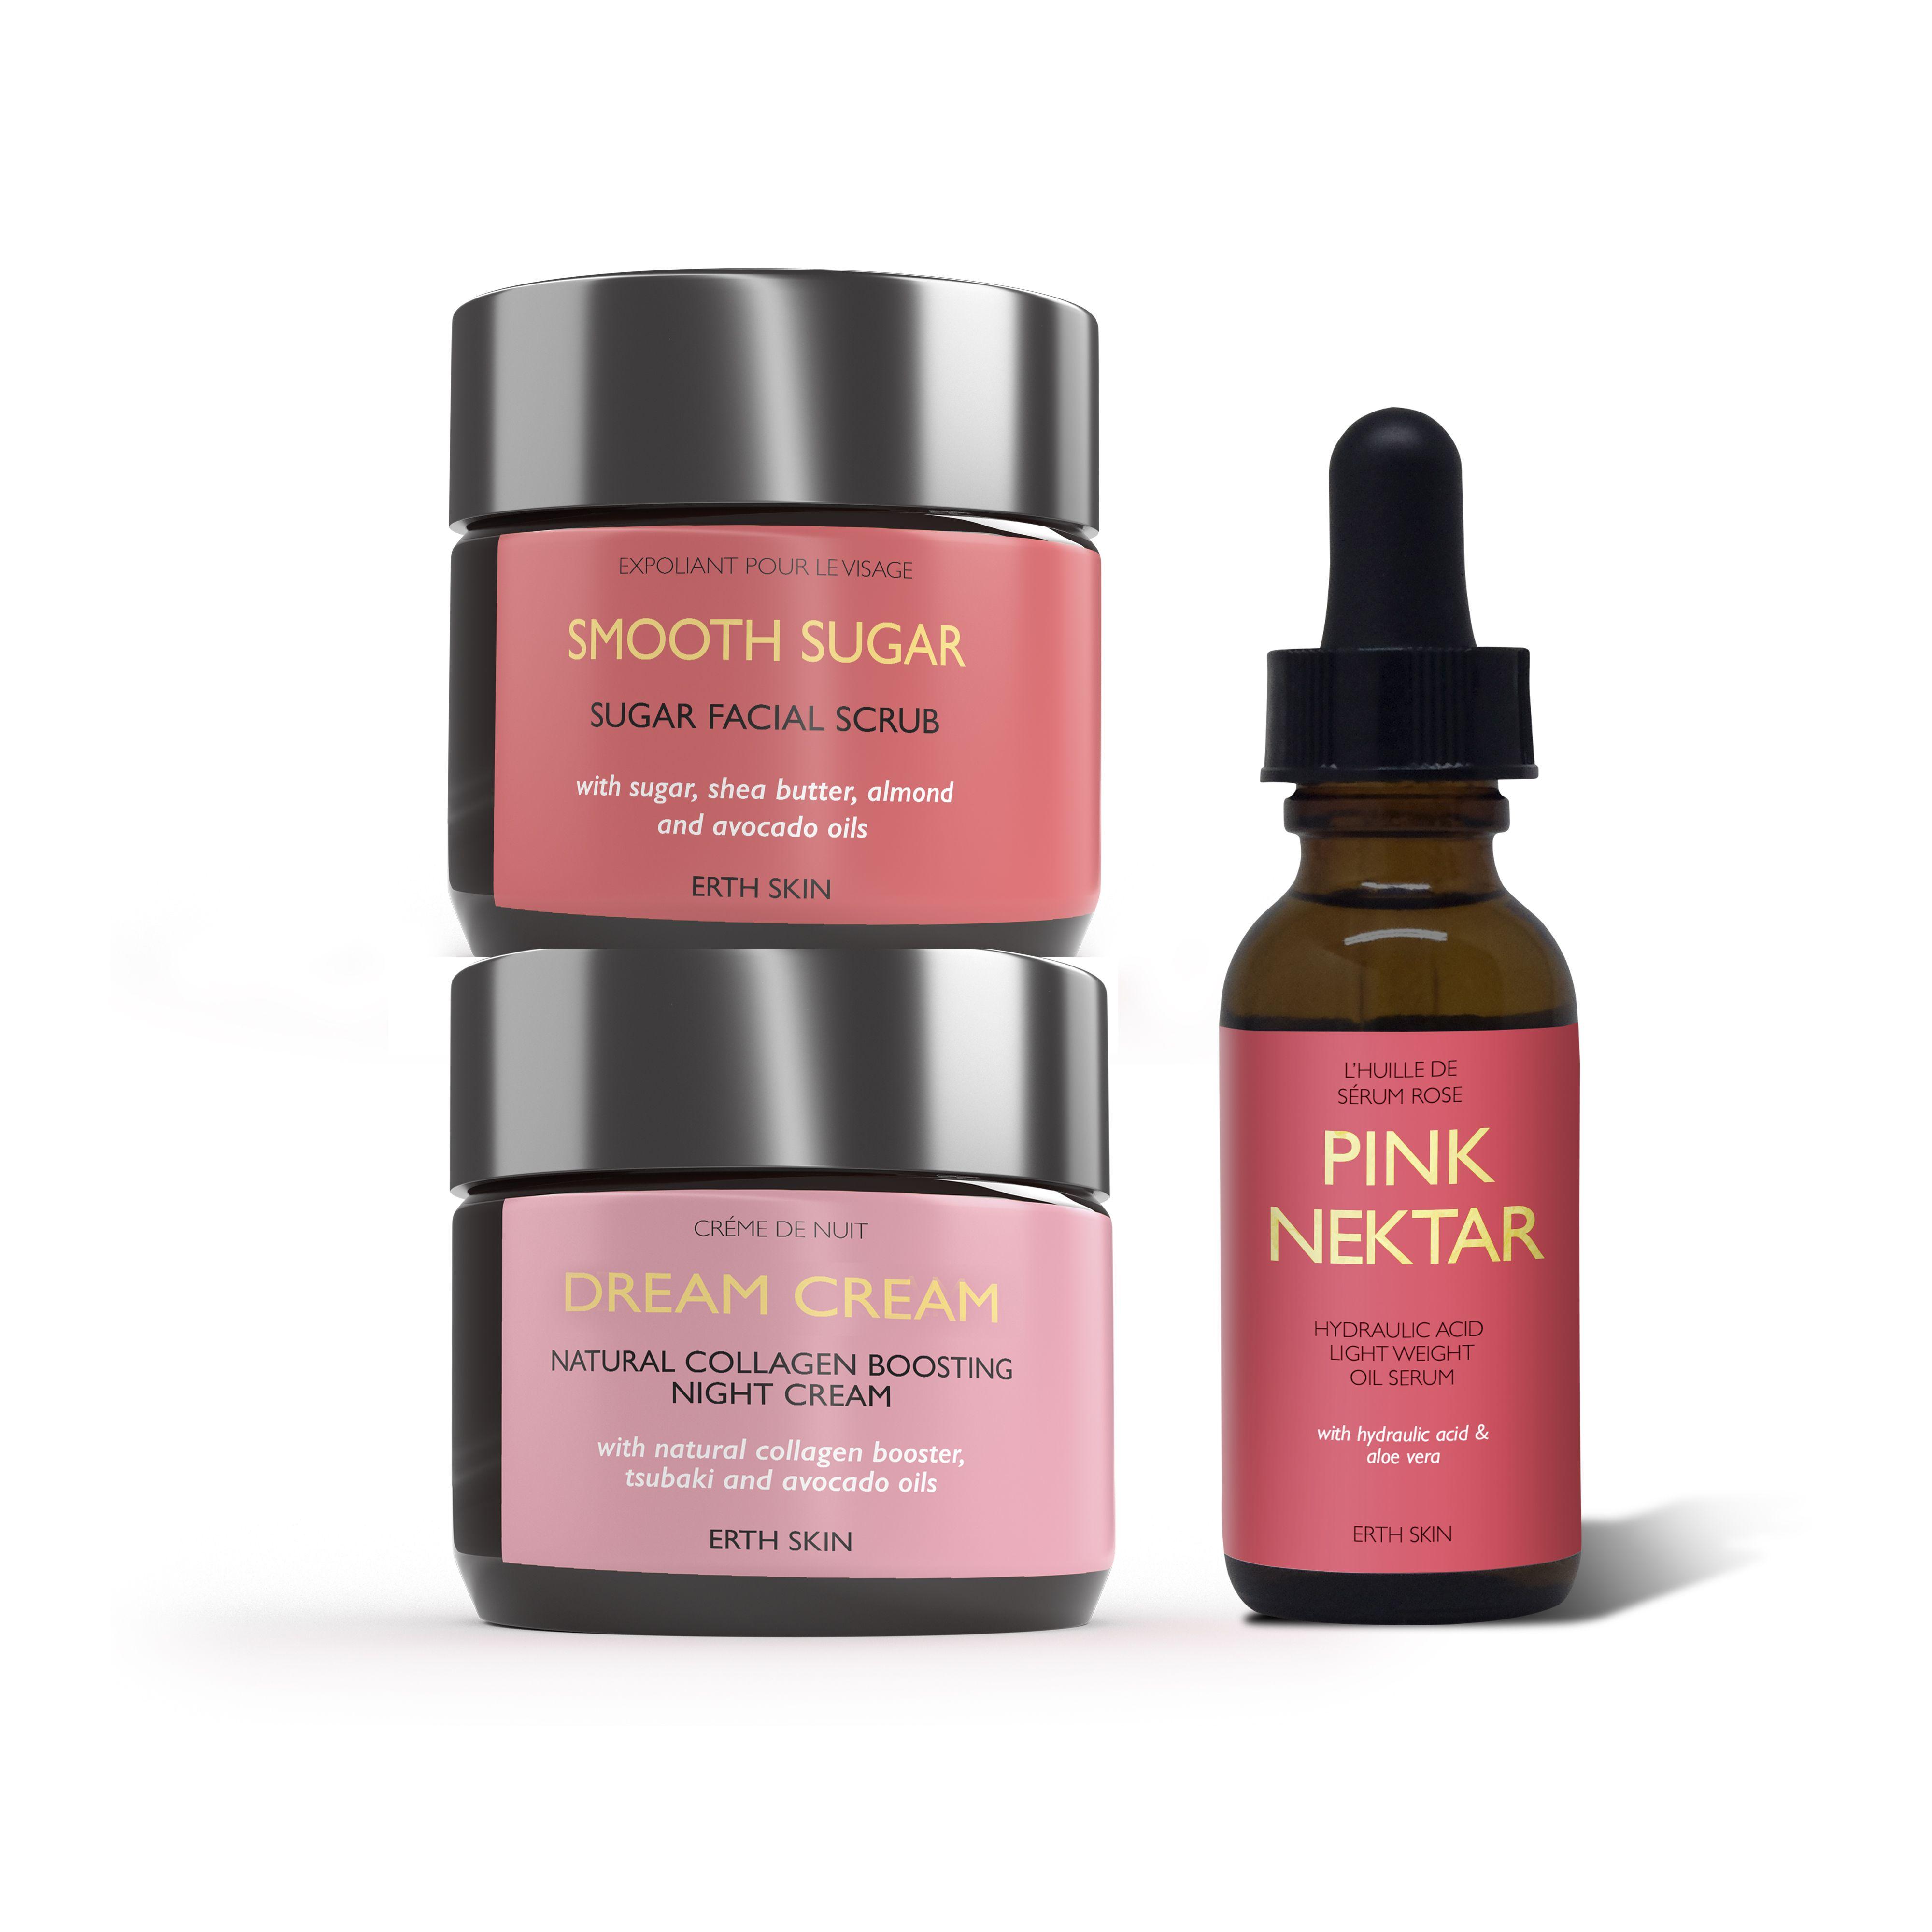 PINK NECTAR - serum +DREAM CREAM - night cream + +SMOOTH SUGAR - sugar scrub